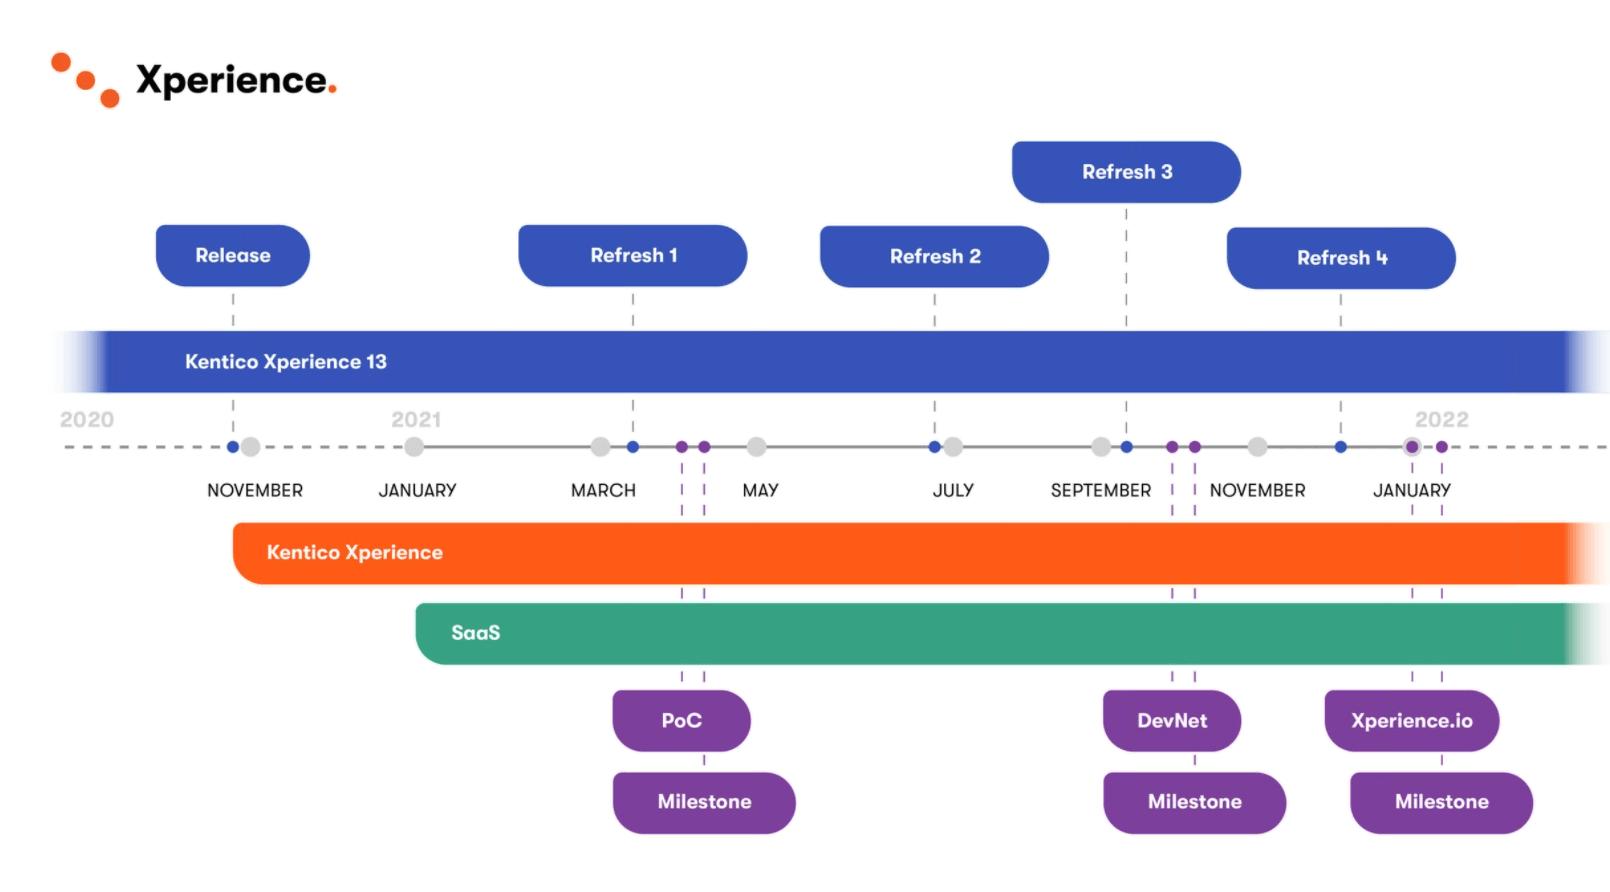 Kentico Xperience roadmap